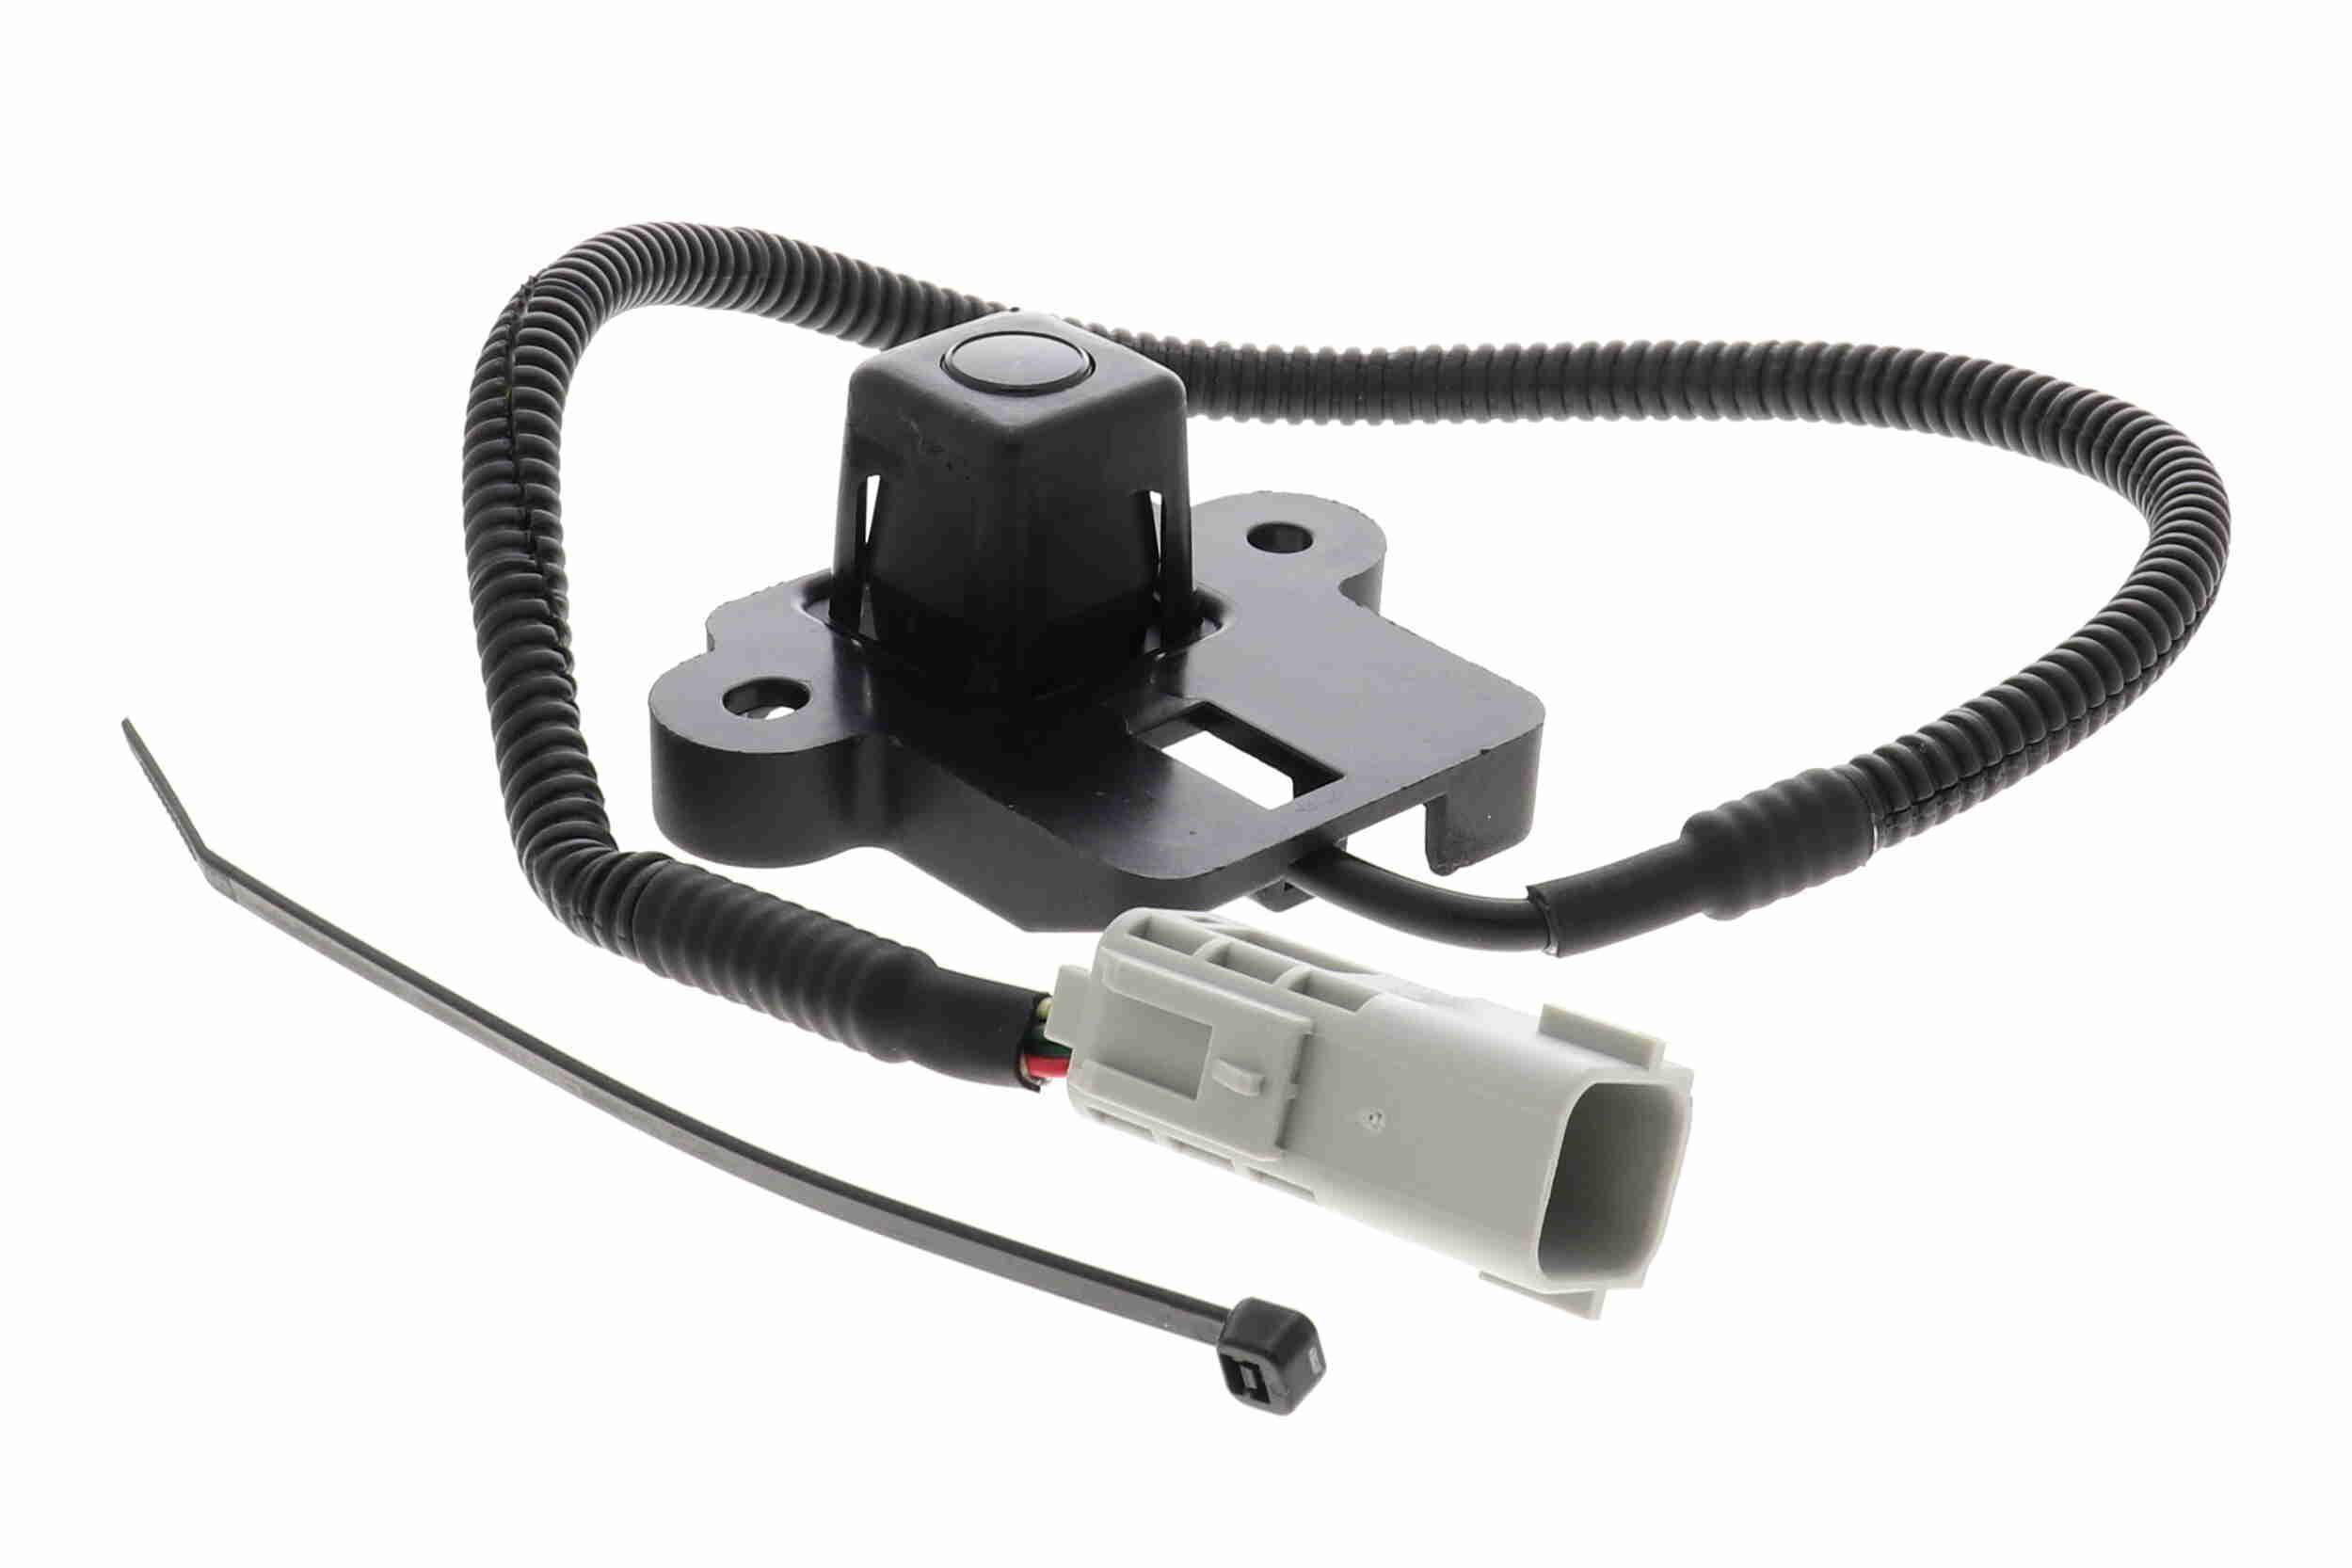 V51-74-0008 VEMO Original VEMO Qualität Rückfahrkamera, Einparkhilfe V51-74-0008 günstig kaufen